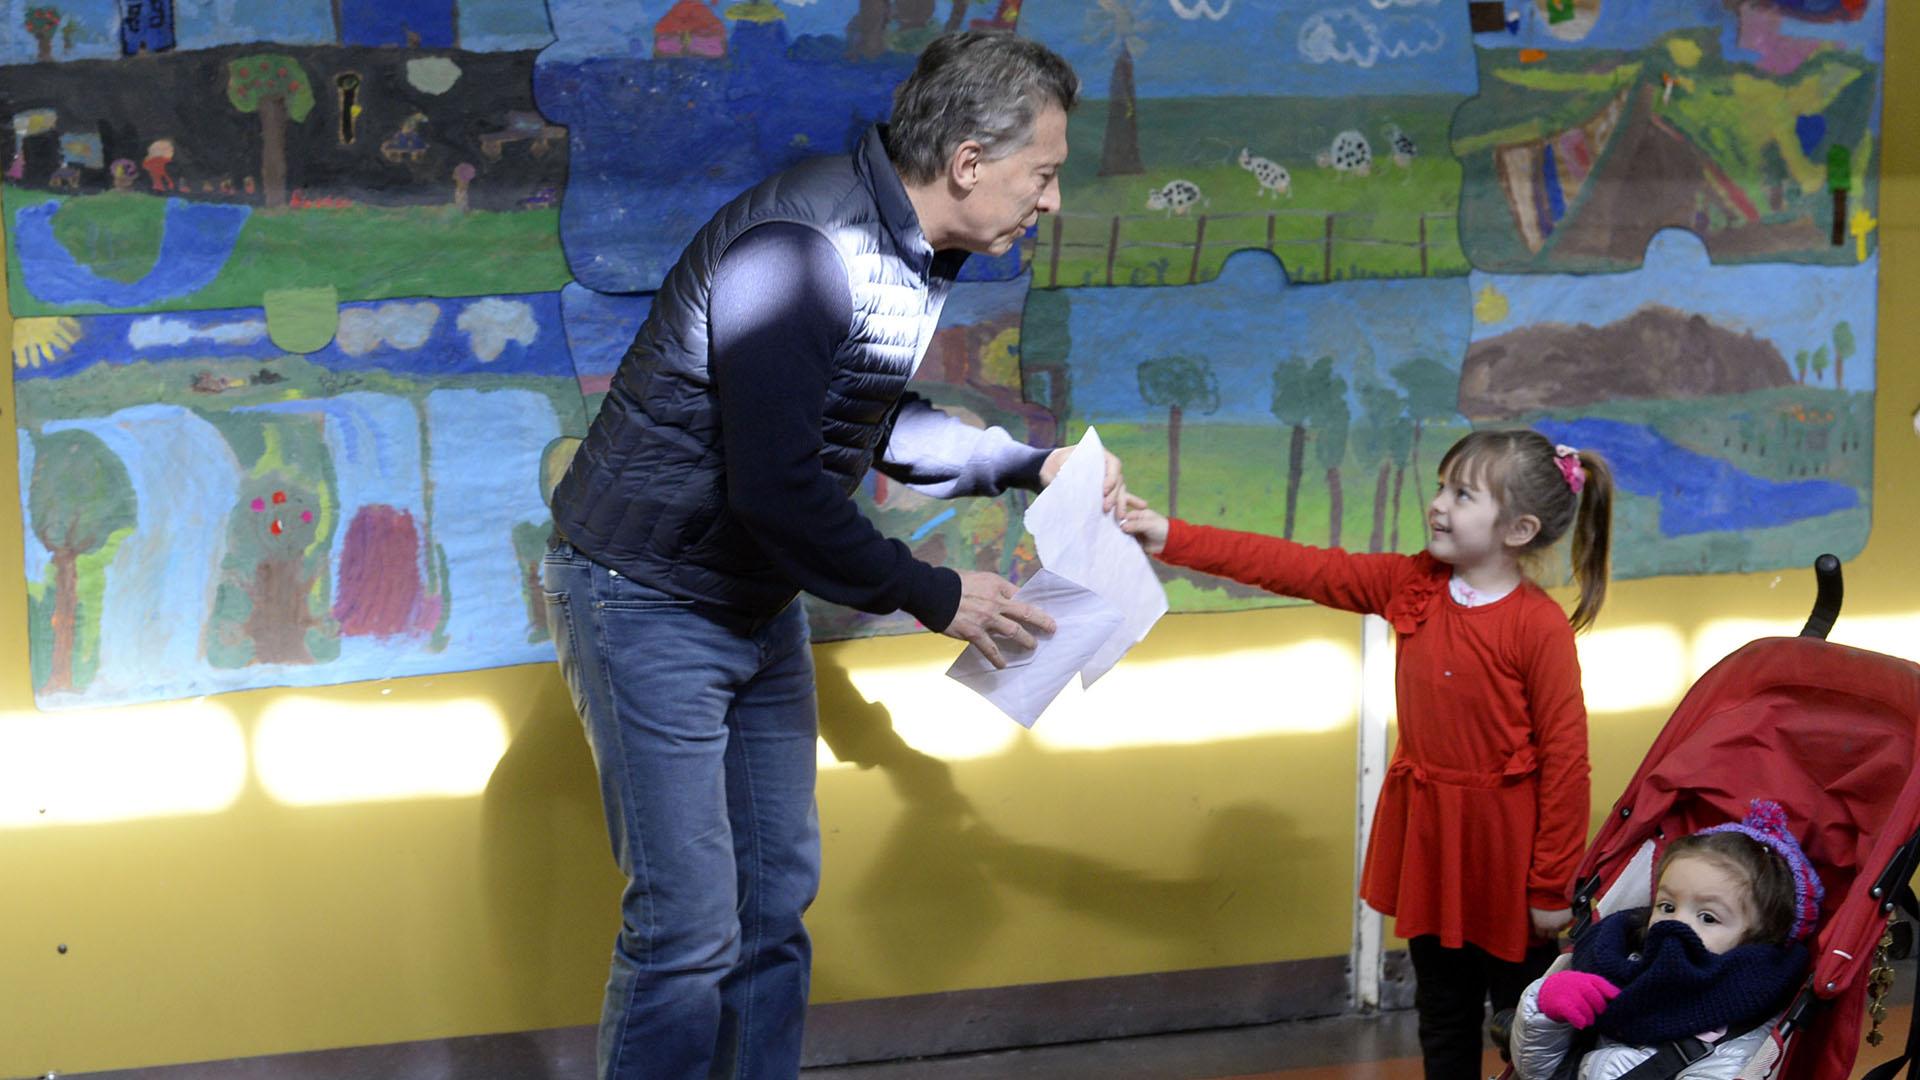 Olivia, la nena que le regaló un dibujo al presidente Macri